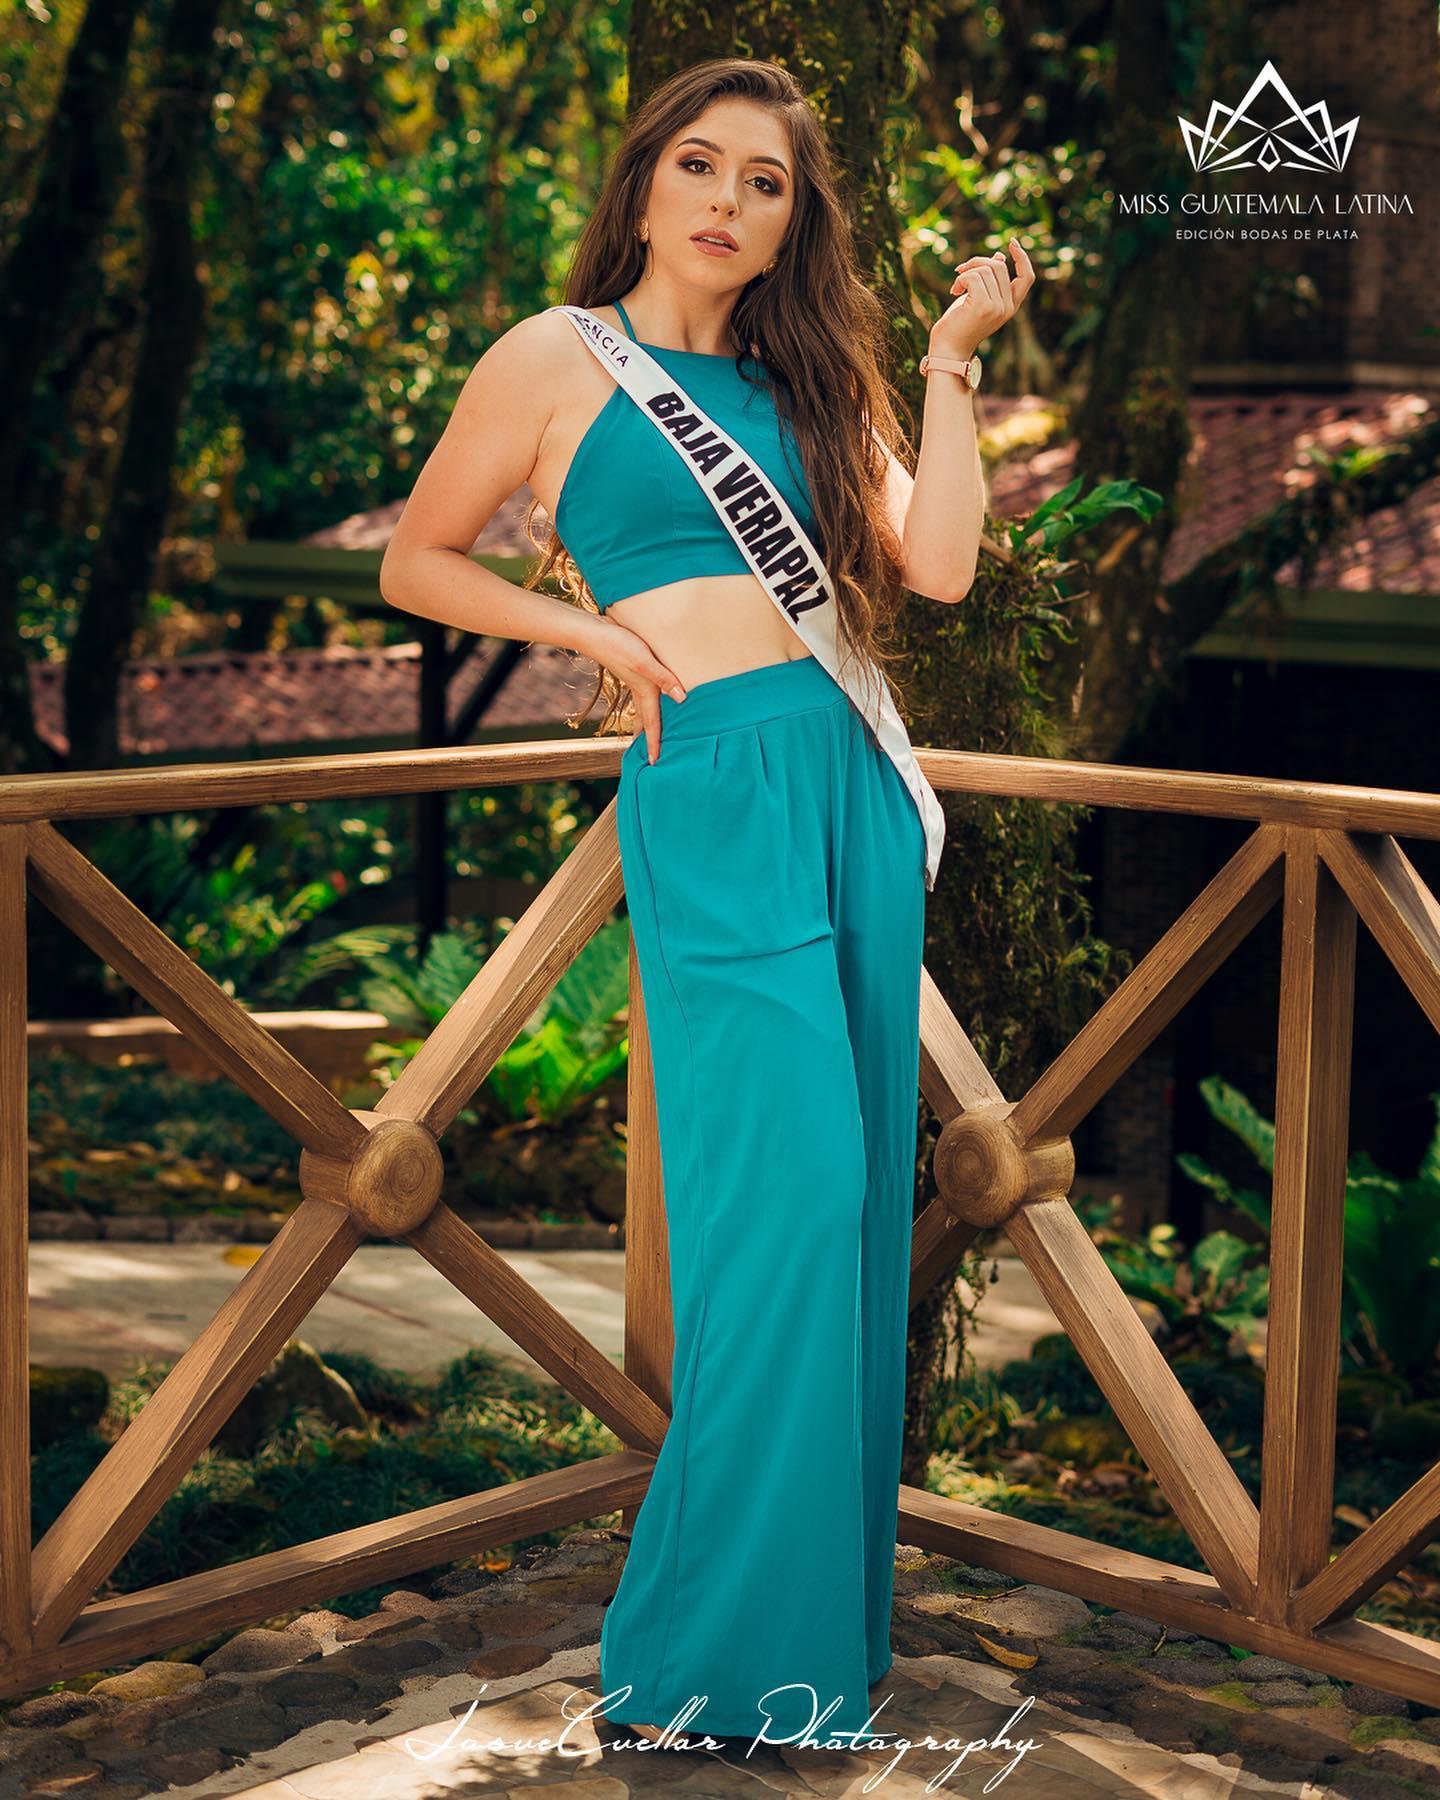 candidatas a miss guatemala latina 2021. final: 30 de abril. - Página 6 BFhW37